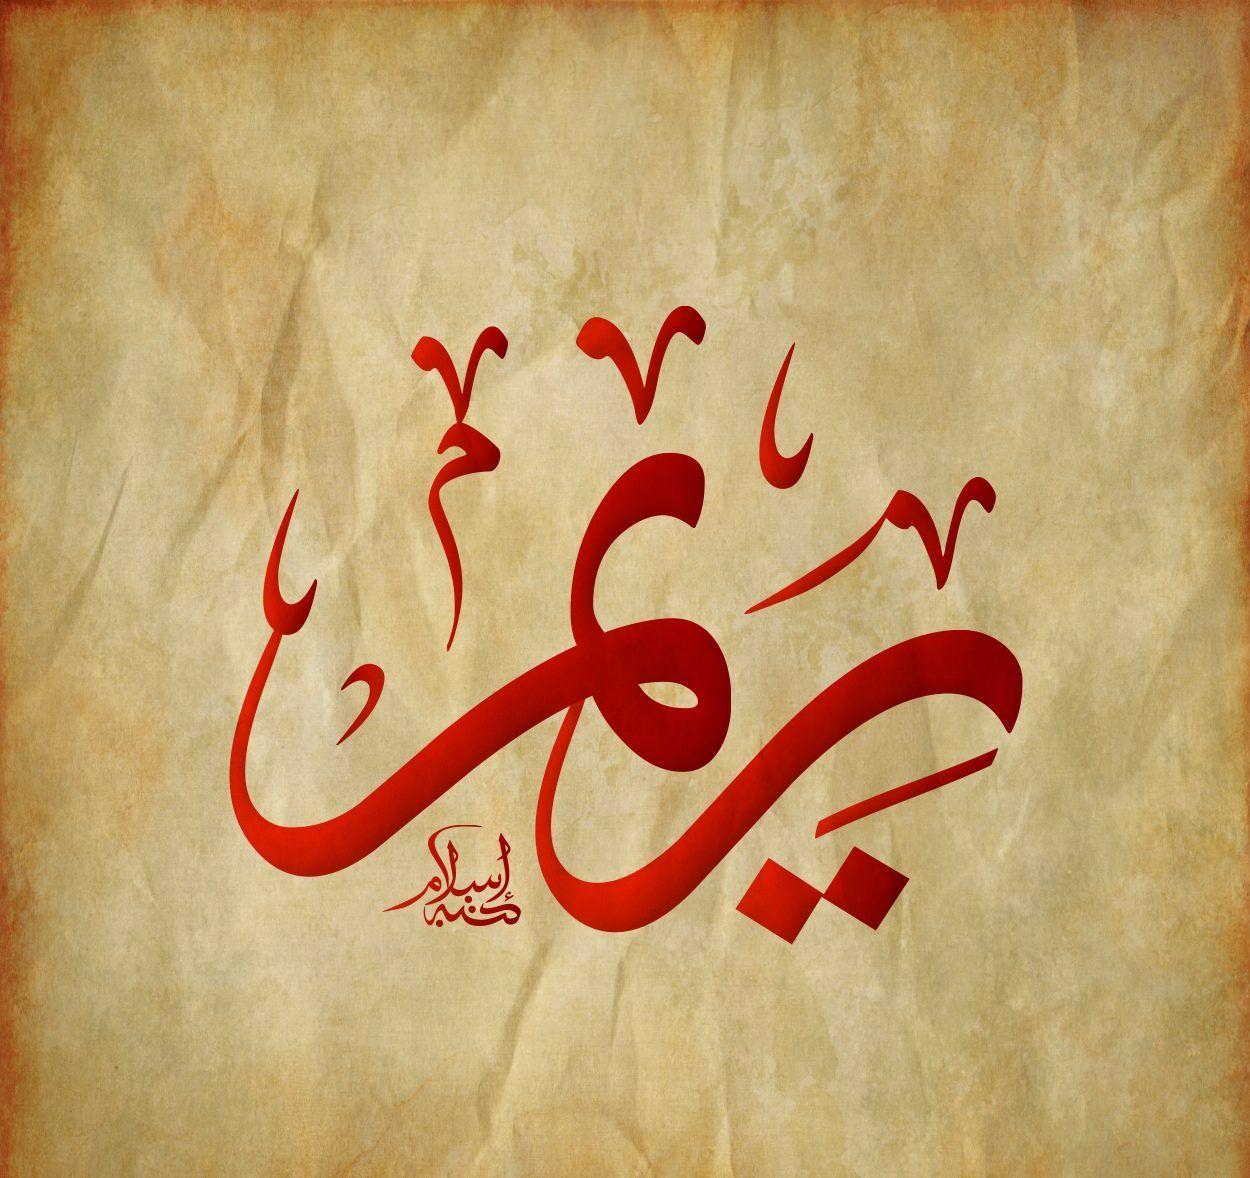 تعر ف على صفات ومعنى اسم ريم Reem ودلع صاحبته موقع مصري In 2021 Islamic Art Calligraphy Calligraphy Name Name Design Art